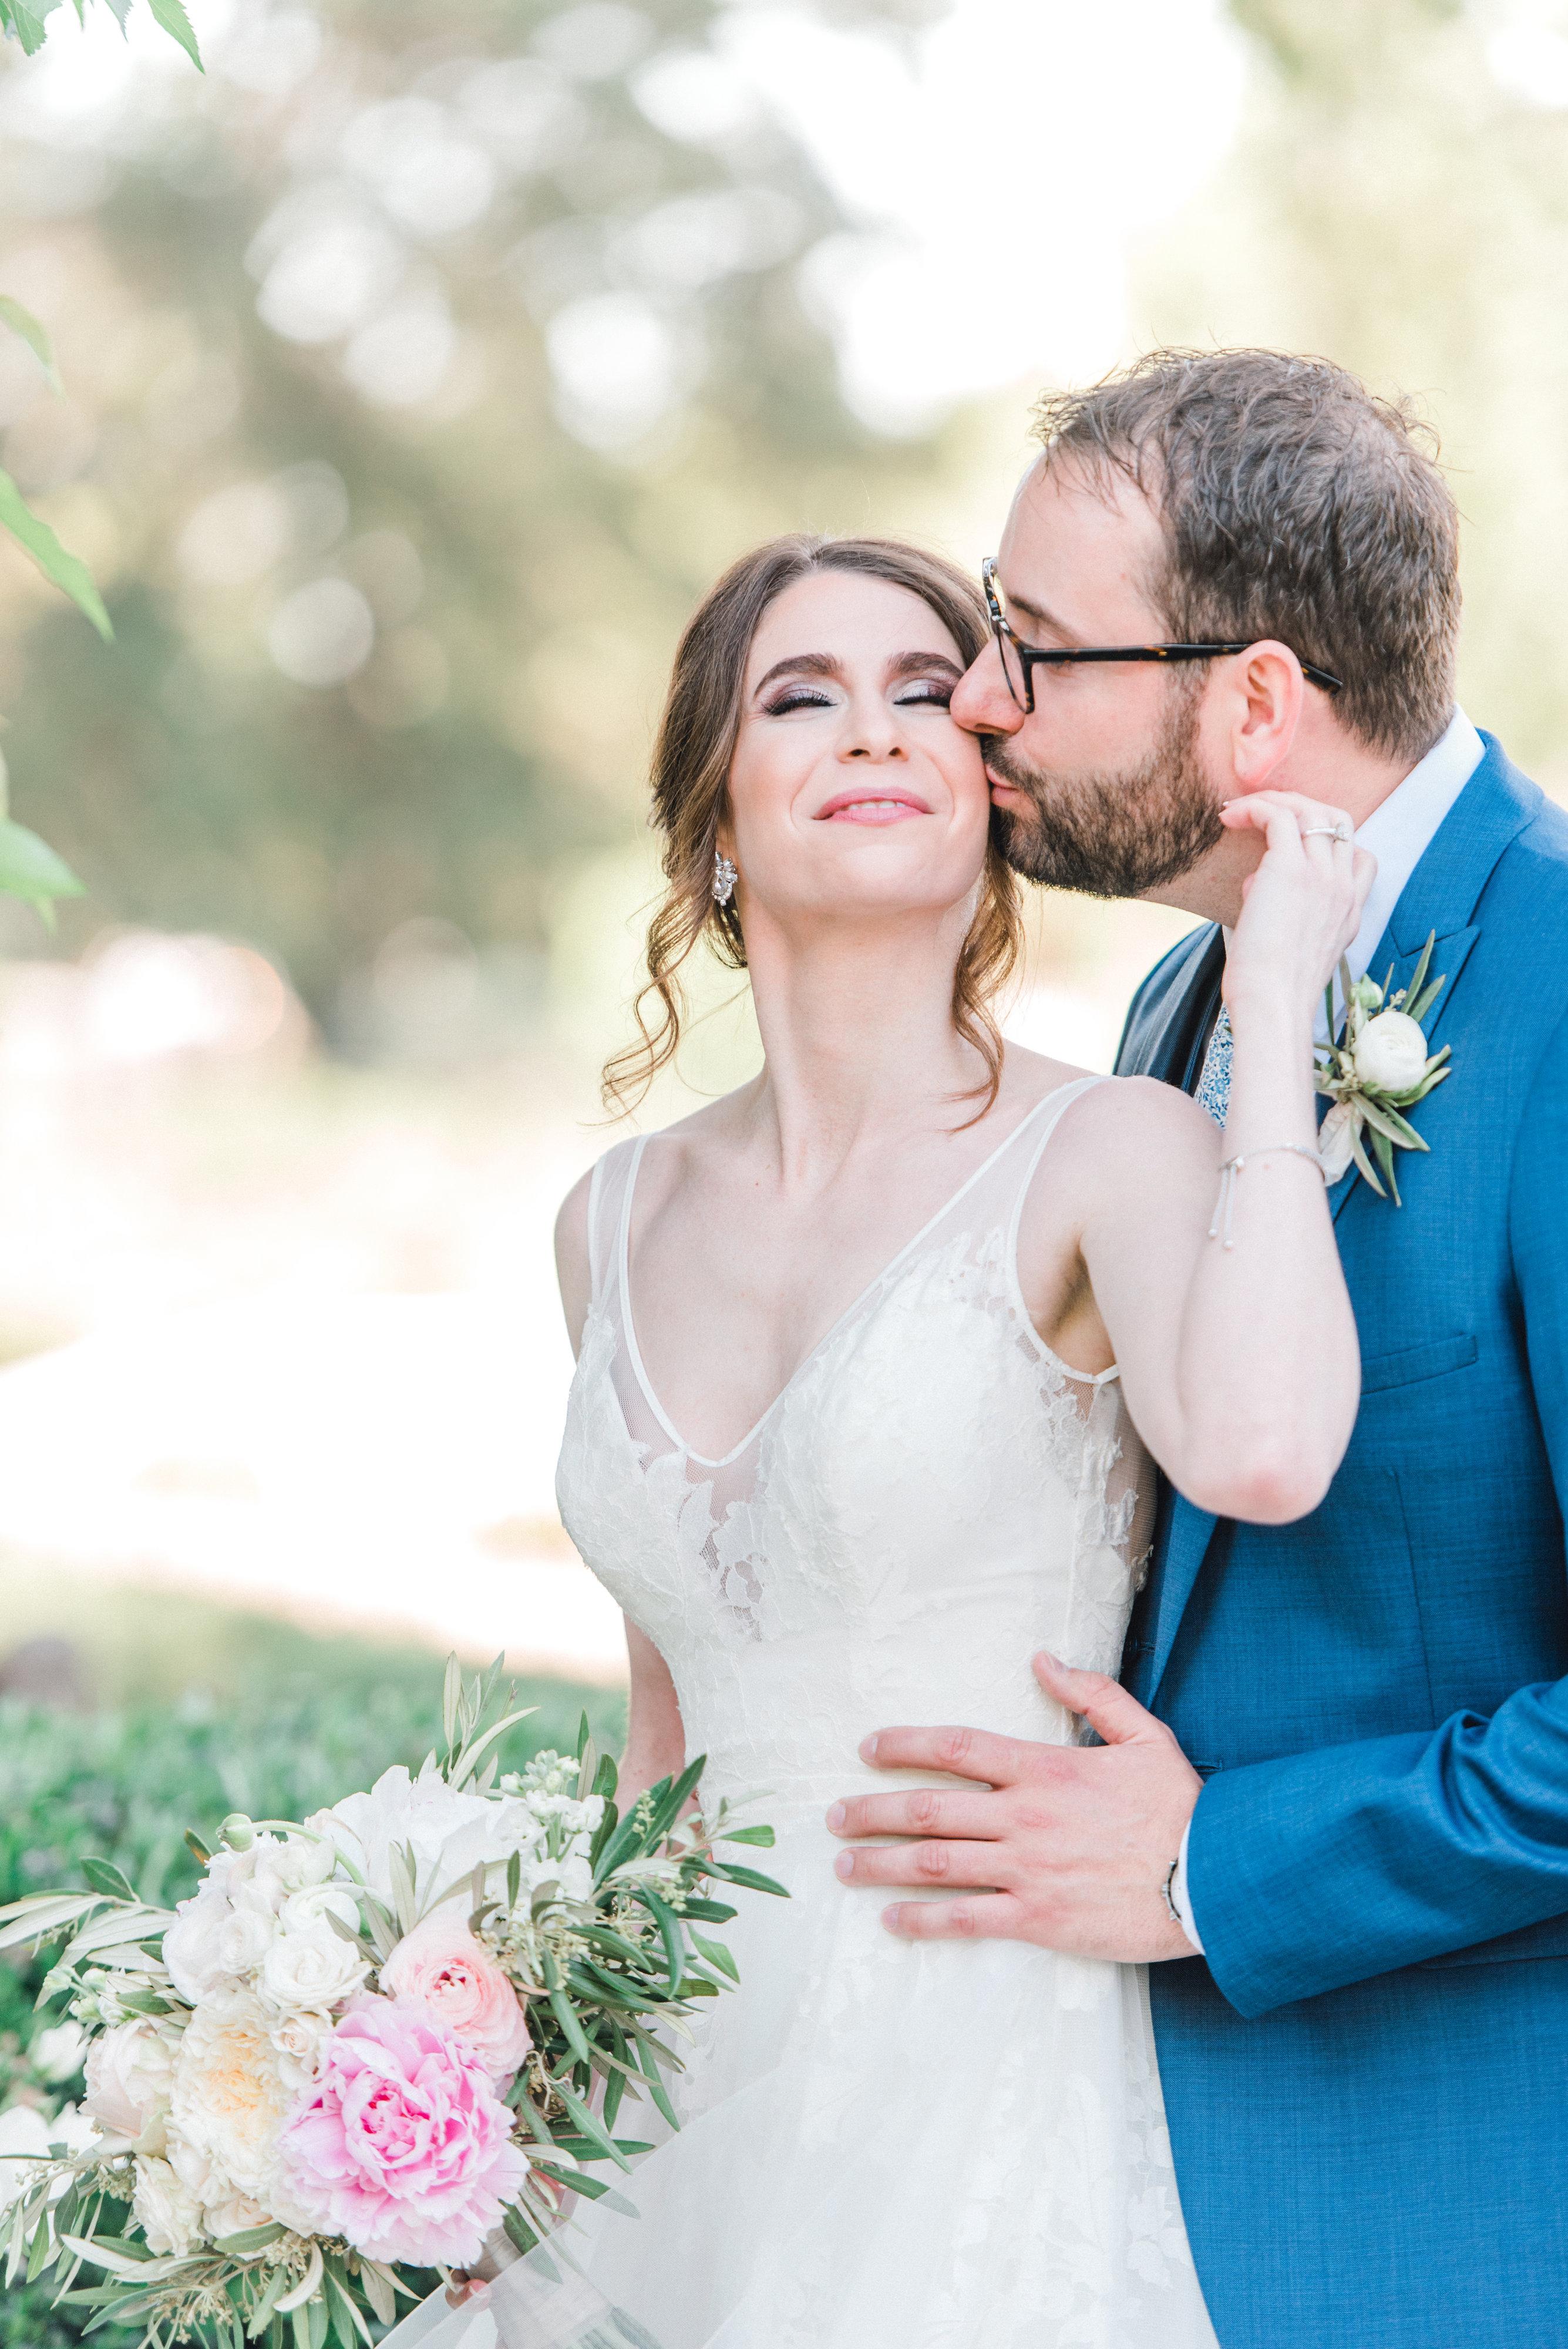 www.weddingsbyscottanddana.com